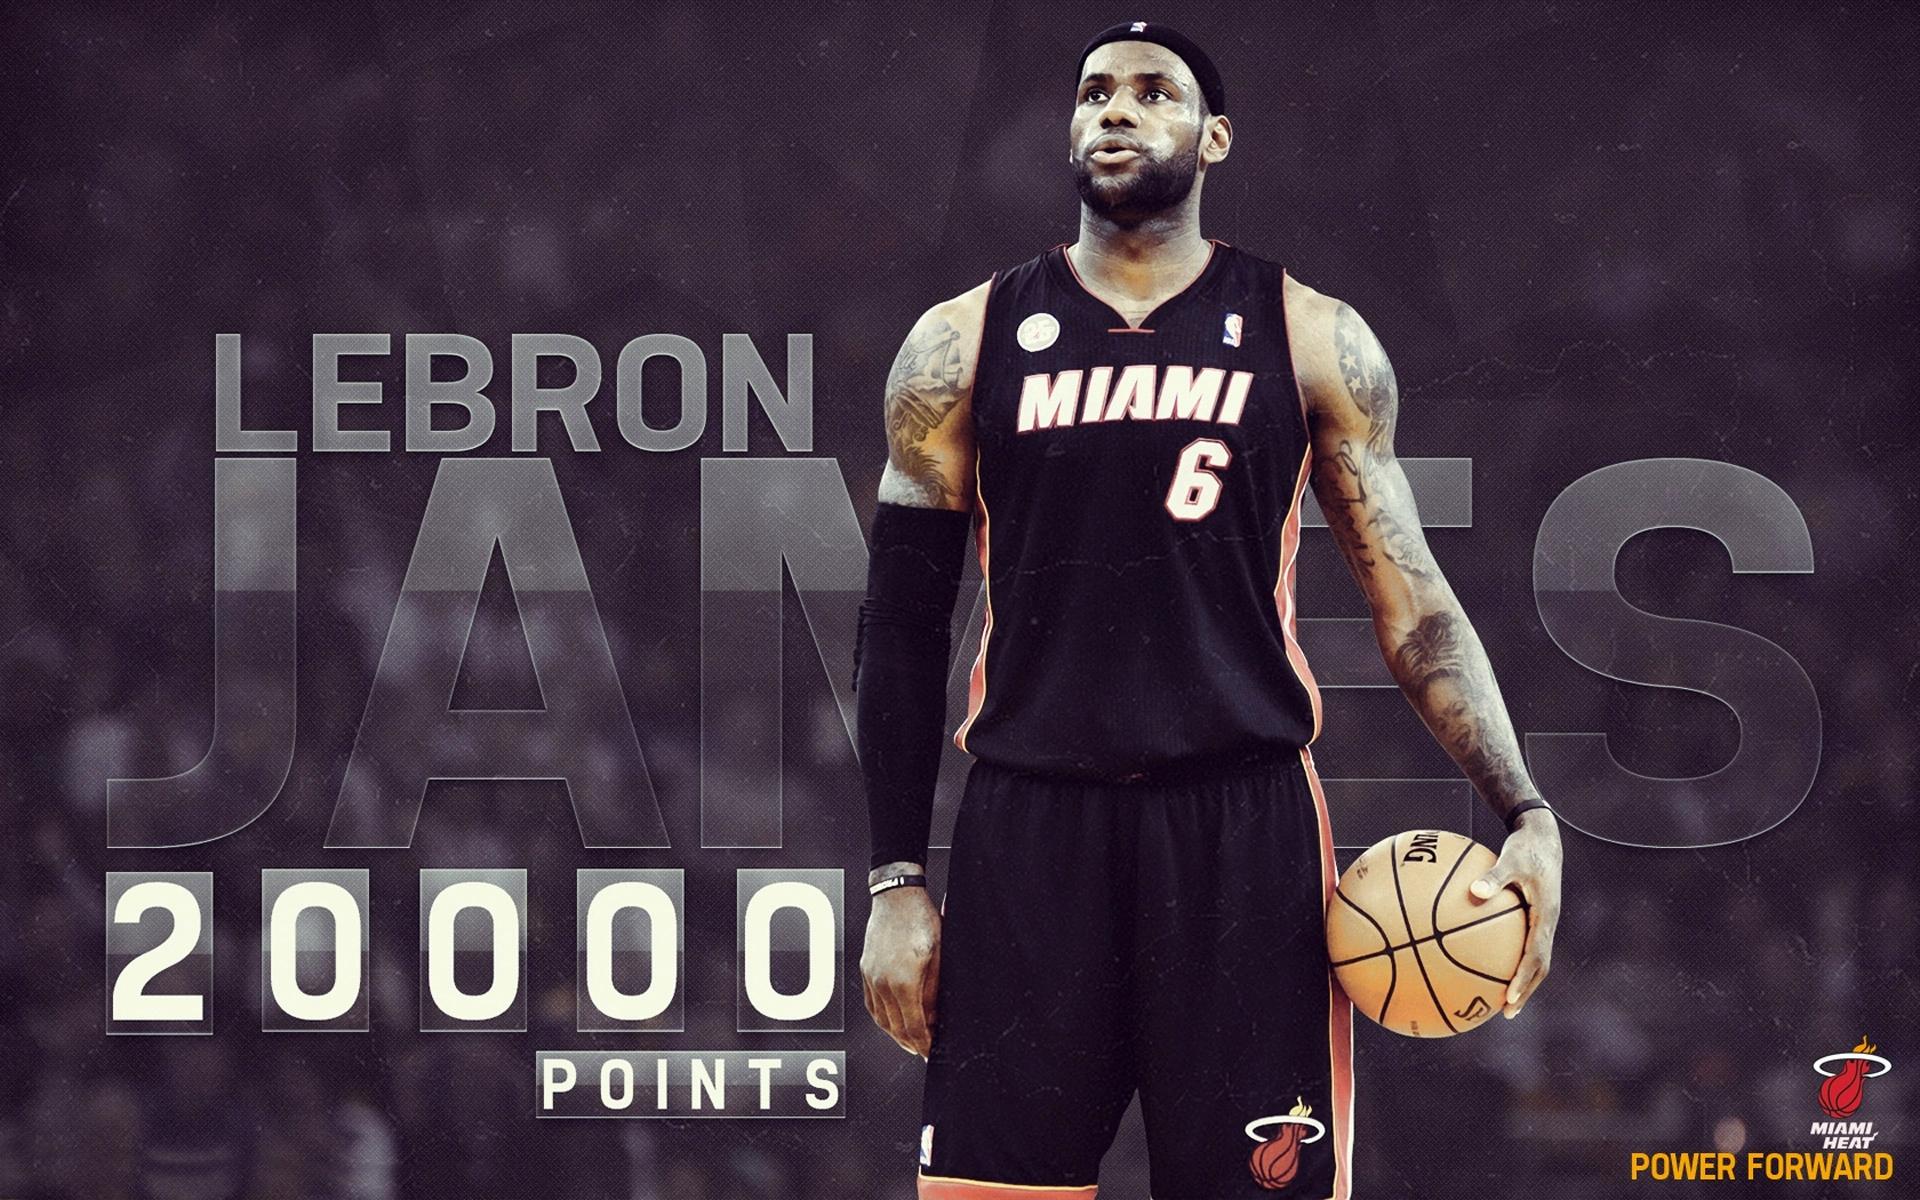 LeBron James NBA Basketball Player Sports Miami Heat Ball Tattoos 1920x1200